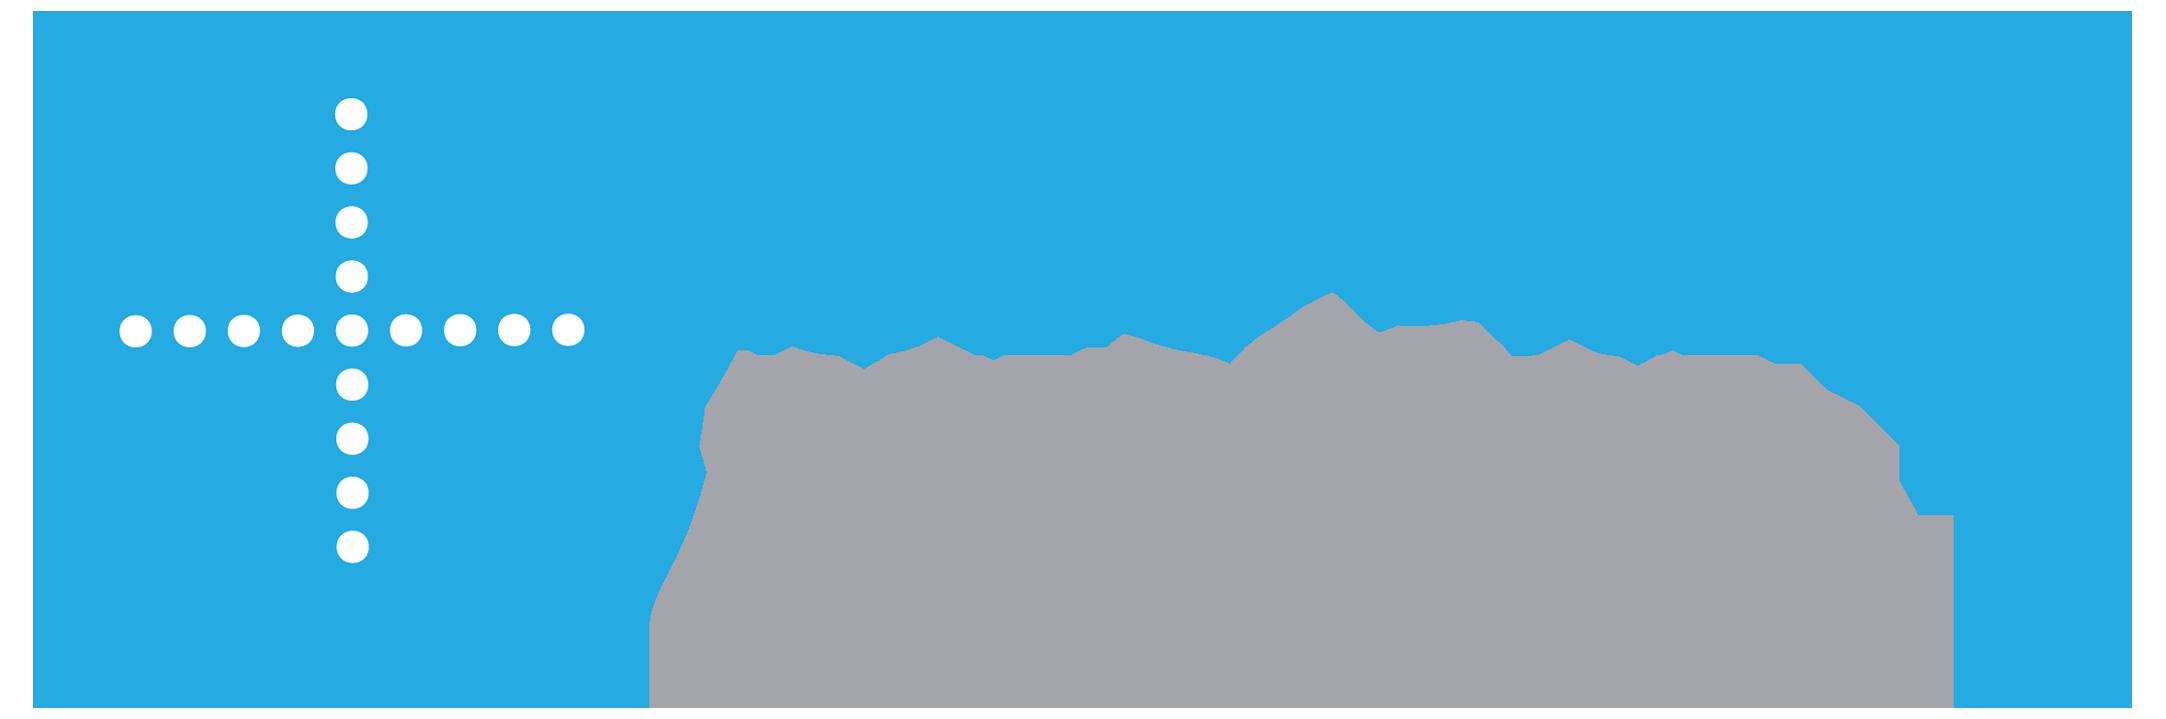 breathe-unity-final